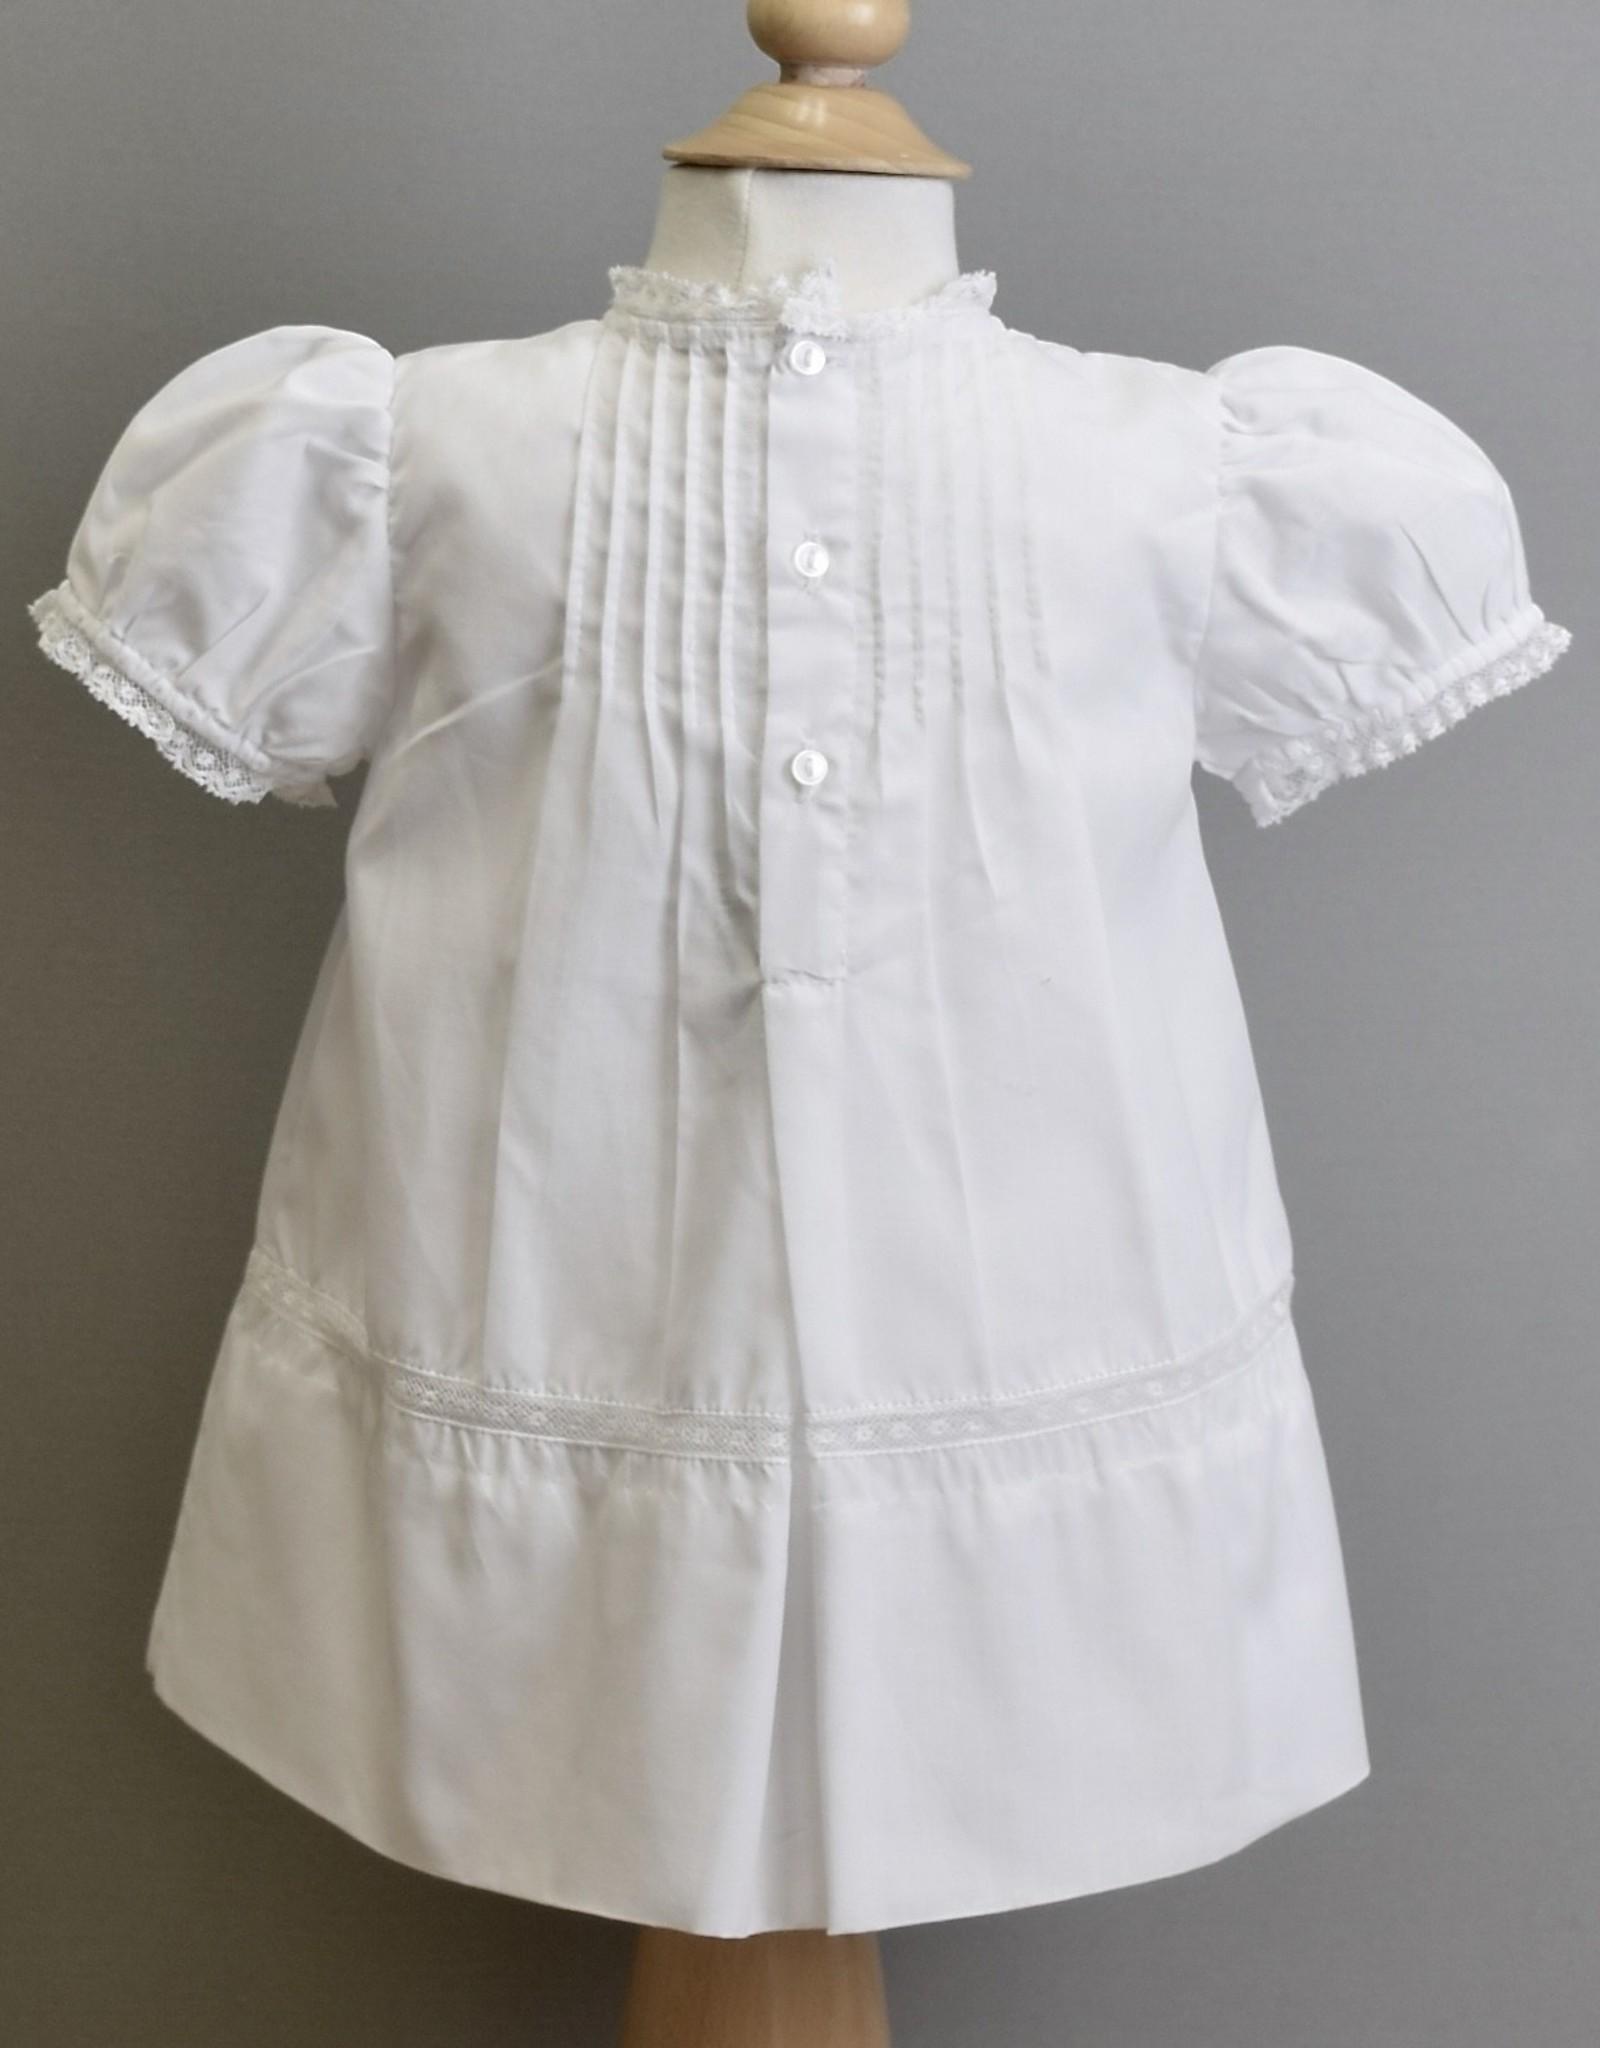 Feltman Dress-White tucks embroidered yoke-Feltman 3m-9m